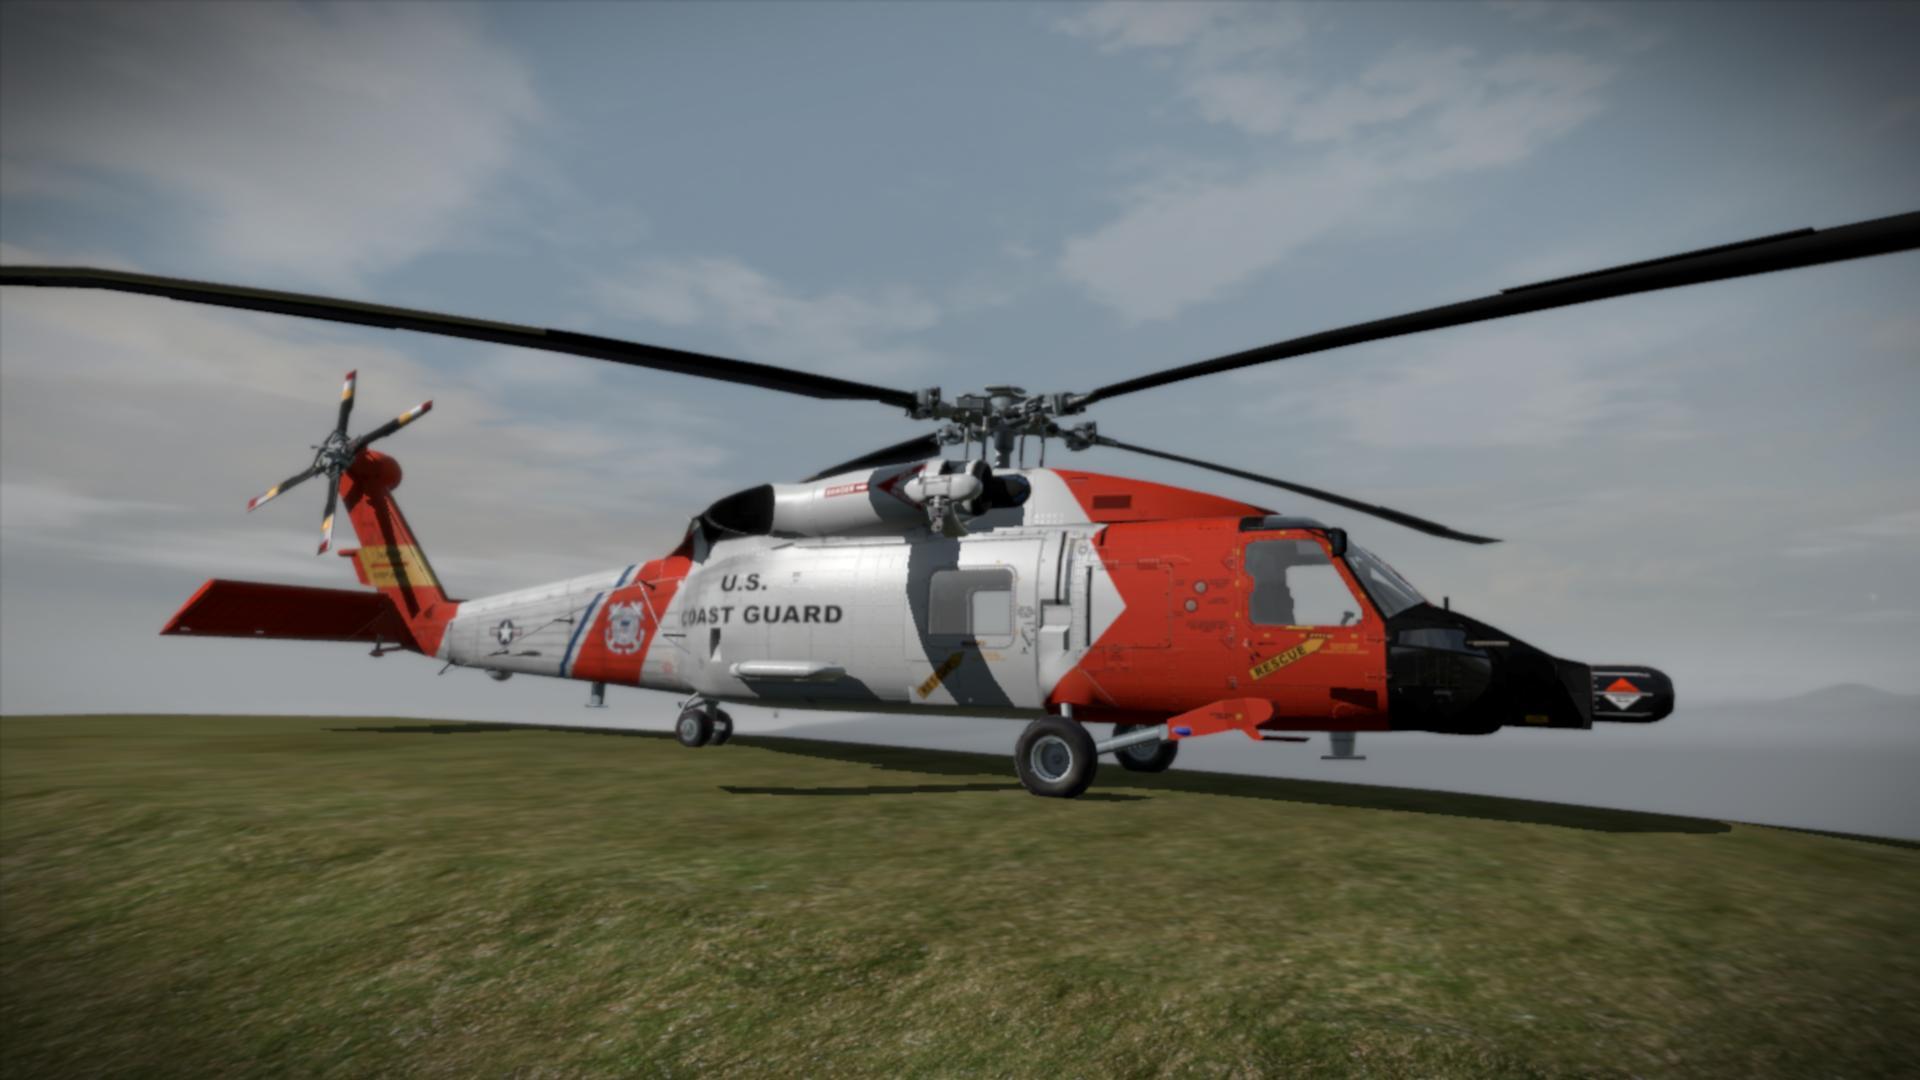 EMT Coast Guard HH-60 JayHawk | City Life RPG Wiki | FANDOM